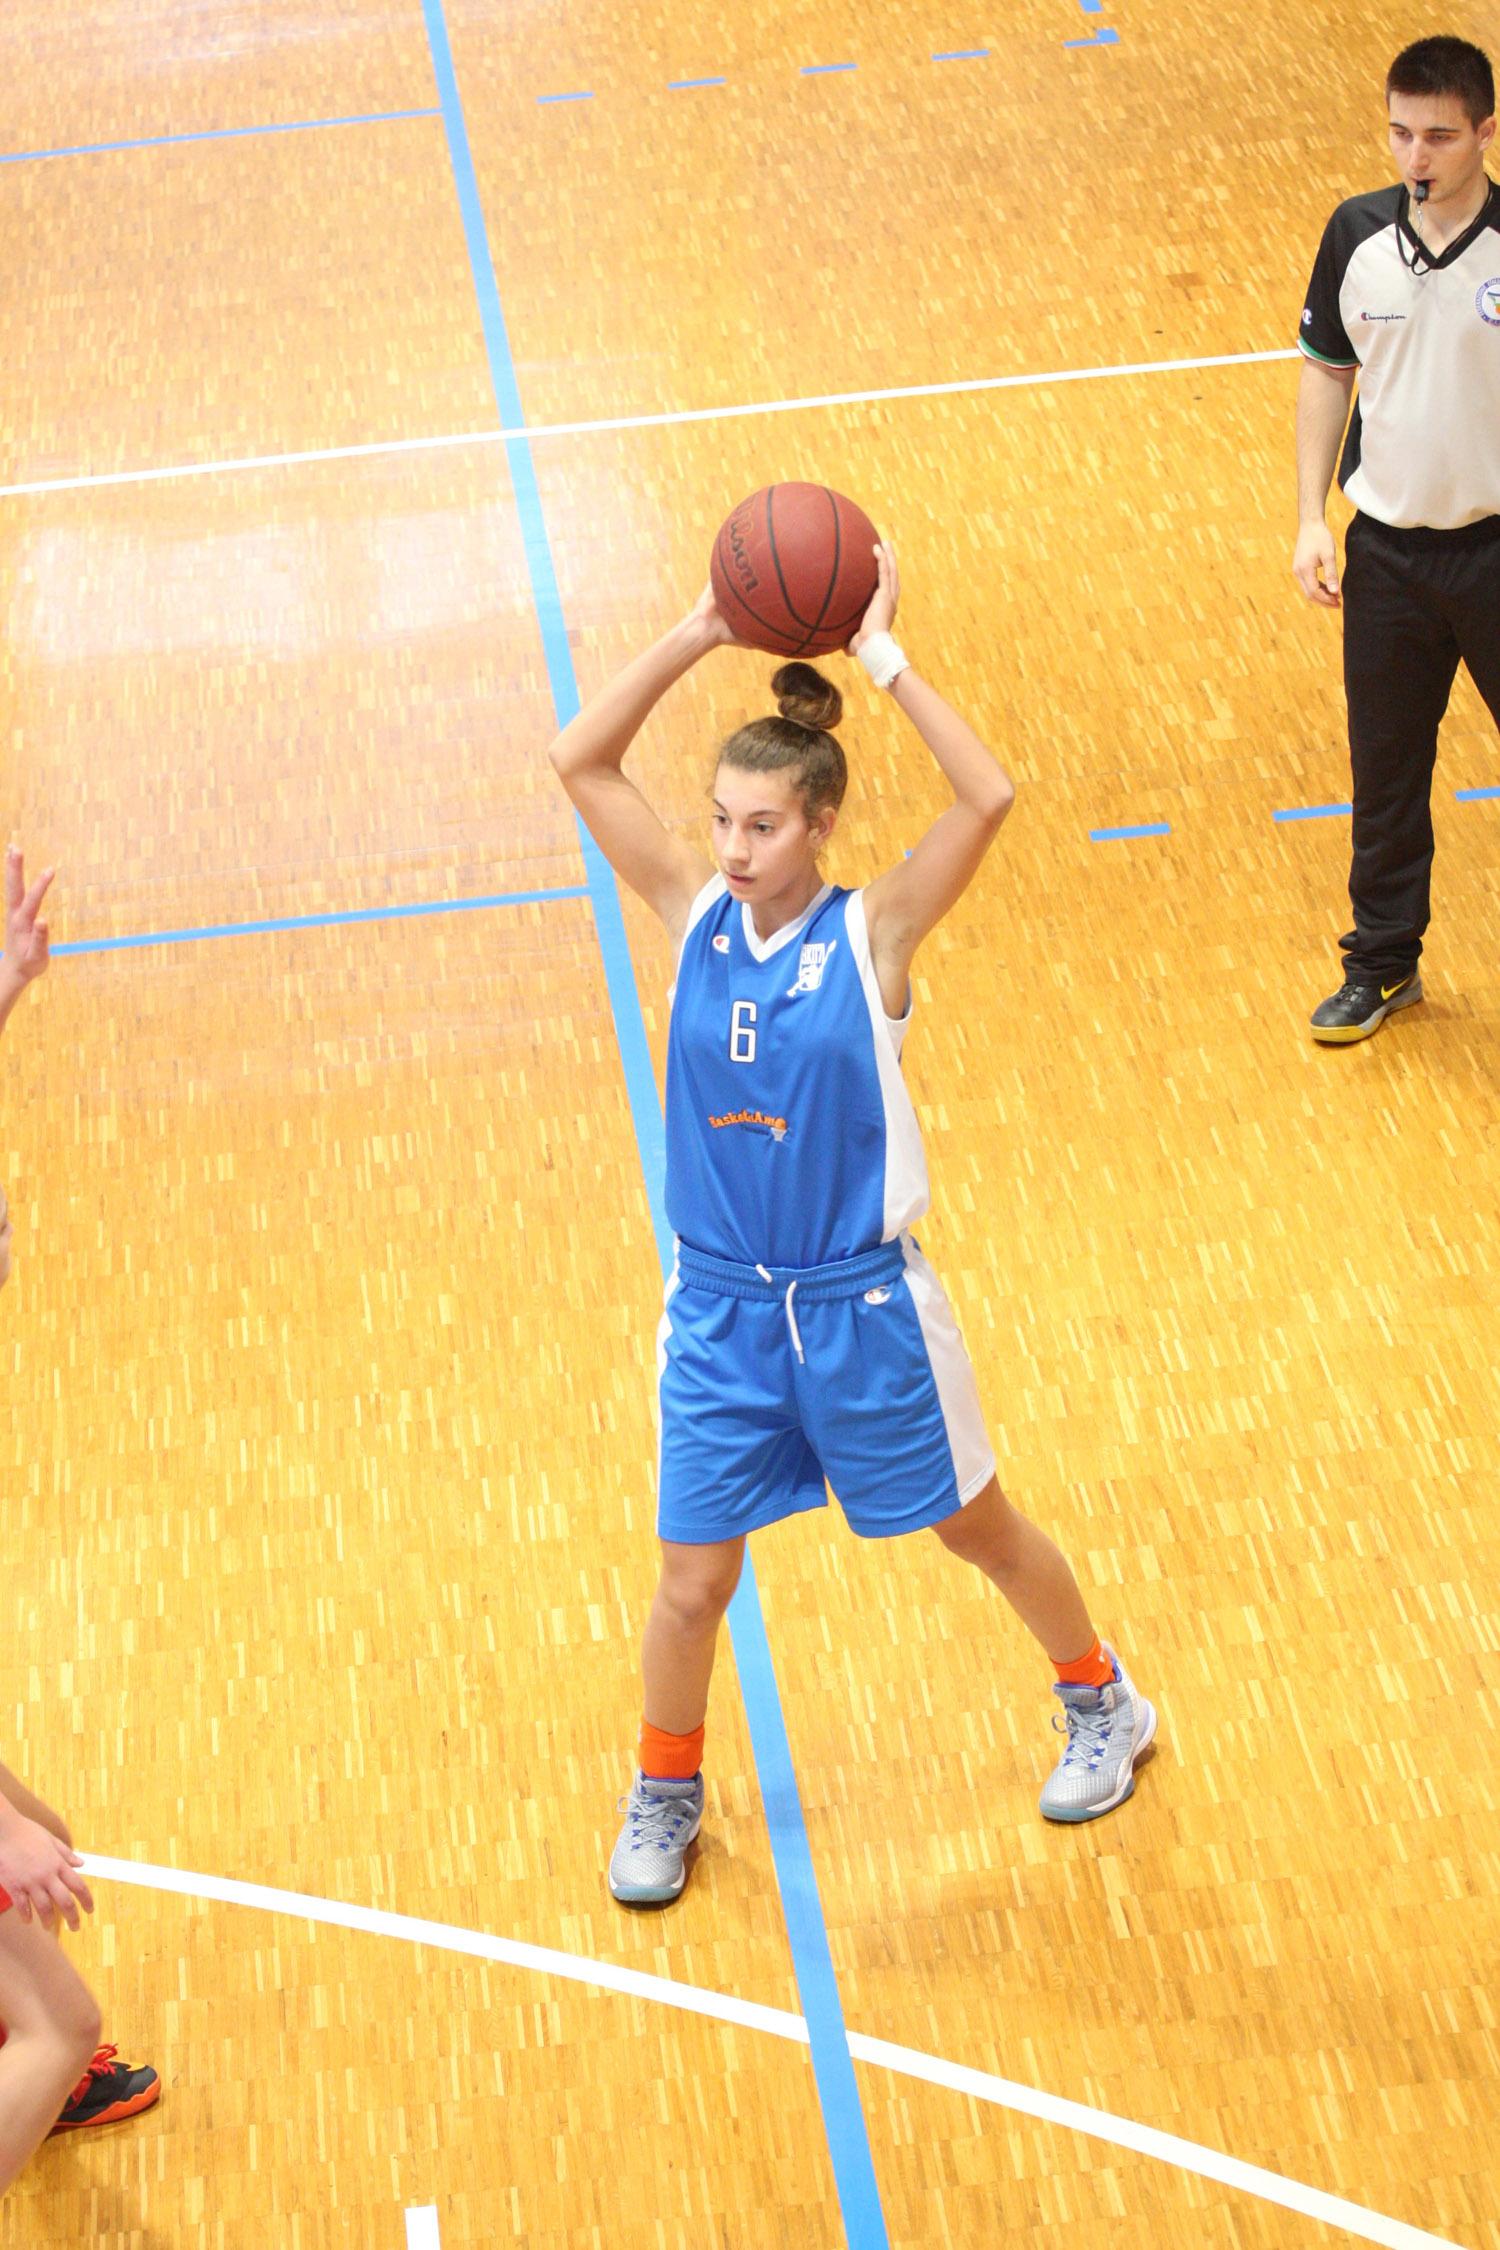 U16E - Costa Masnaga vs Baskettiamo Vittuone 2001 00033.jpg